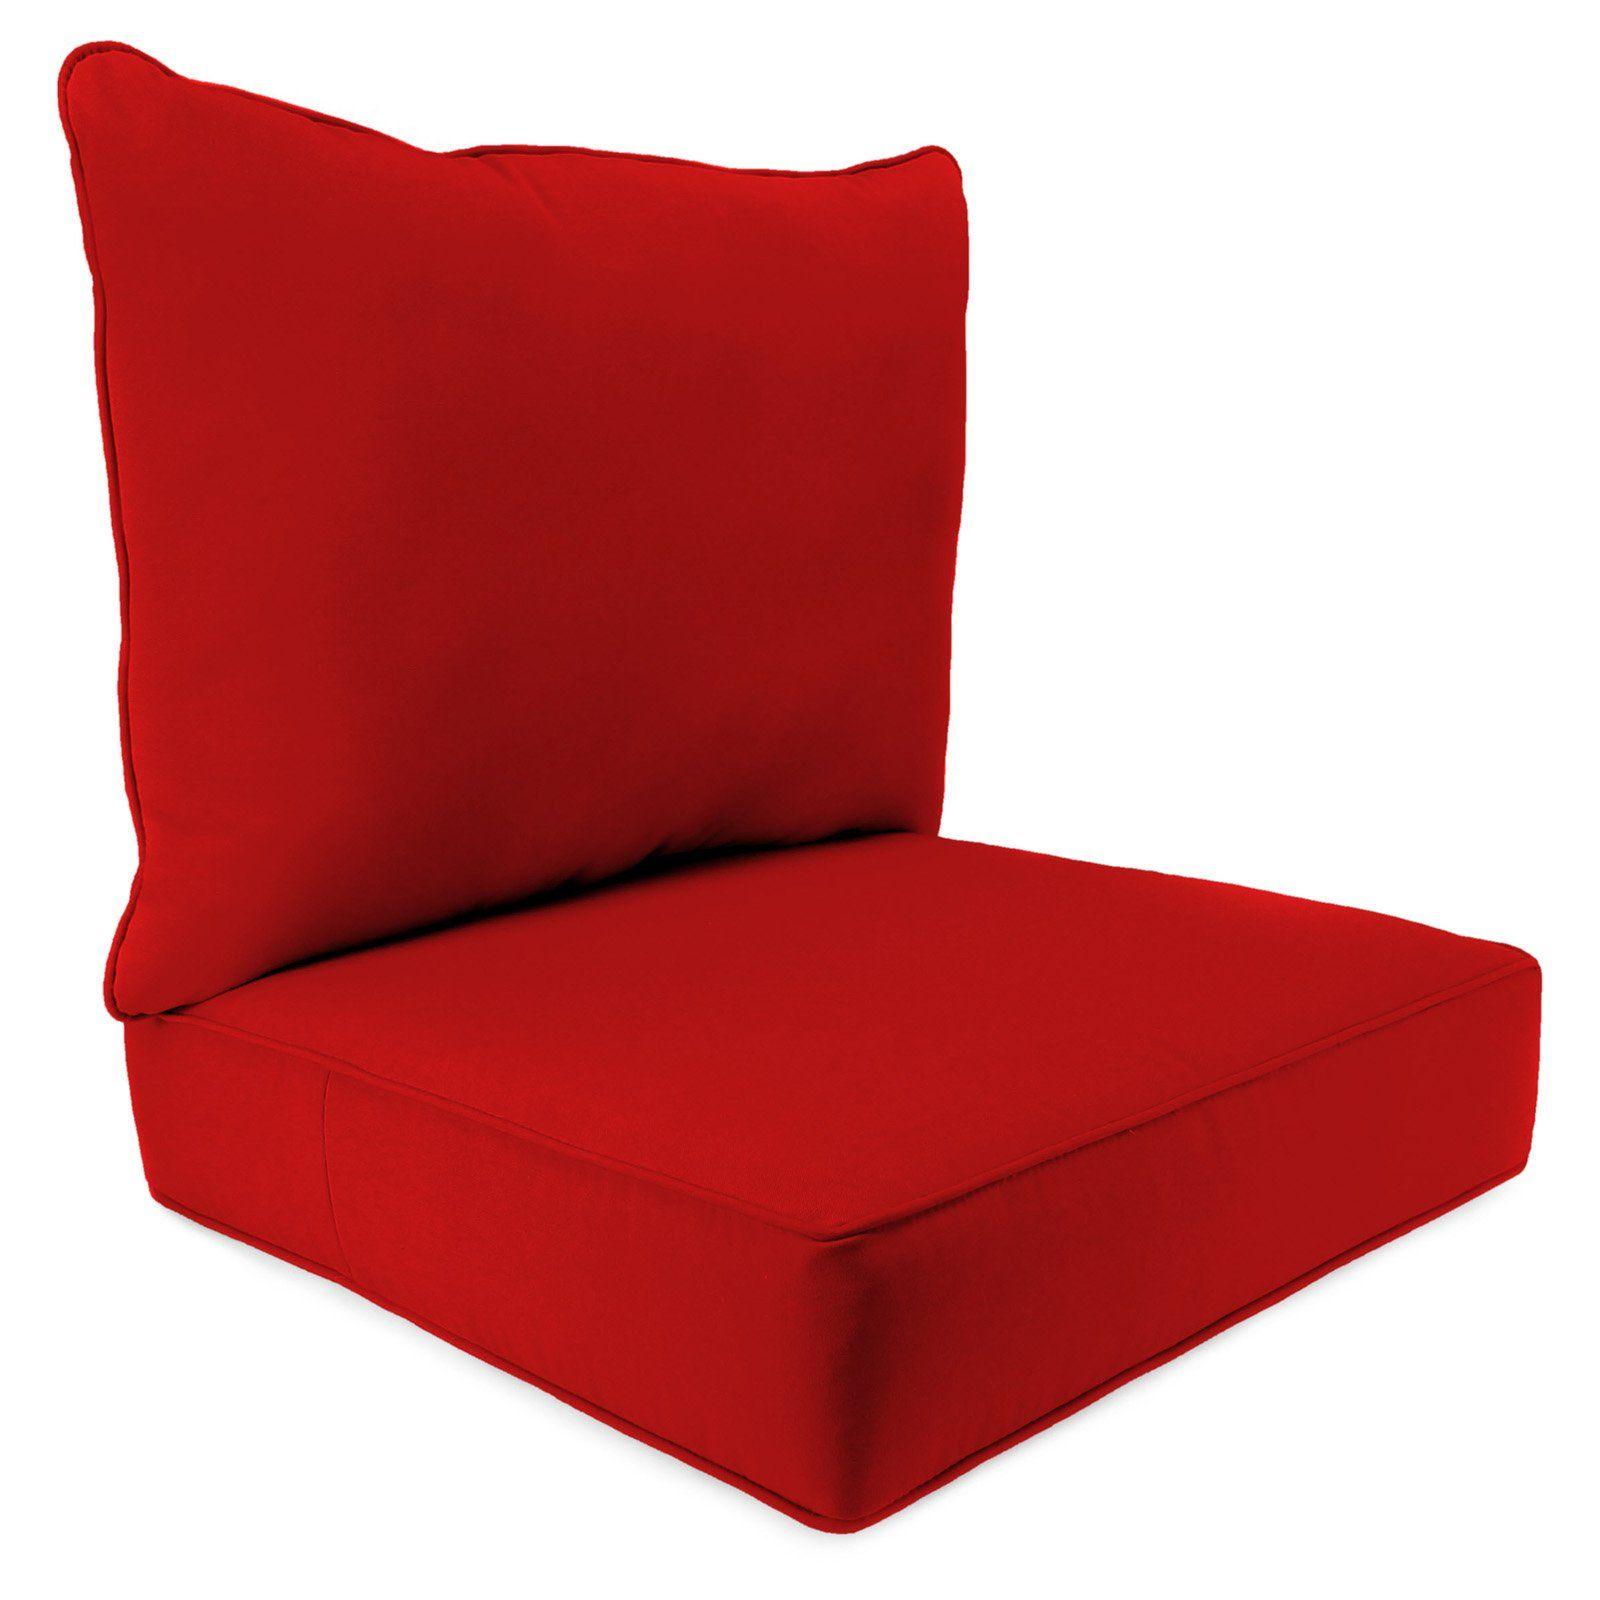 Jordan Manufacturing Sunbrella 2 Piece Outdoor Deep Seat Chair Cushion In 2021 Deep Seat Cushions Chair Cushions Deep Seating